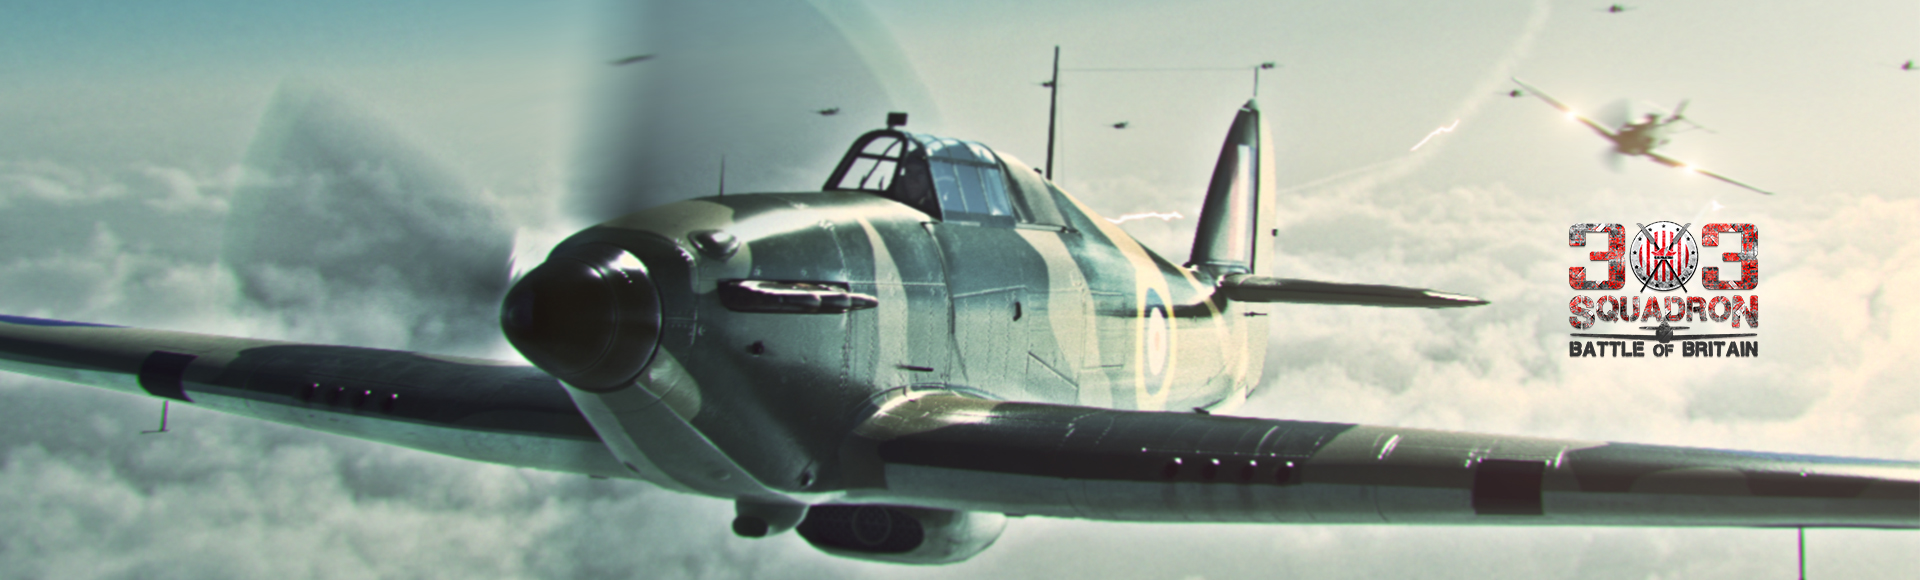 Banner-303-squadron